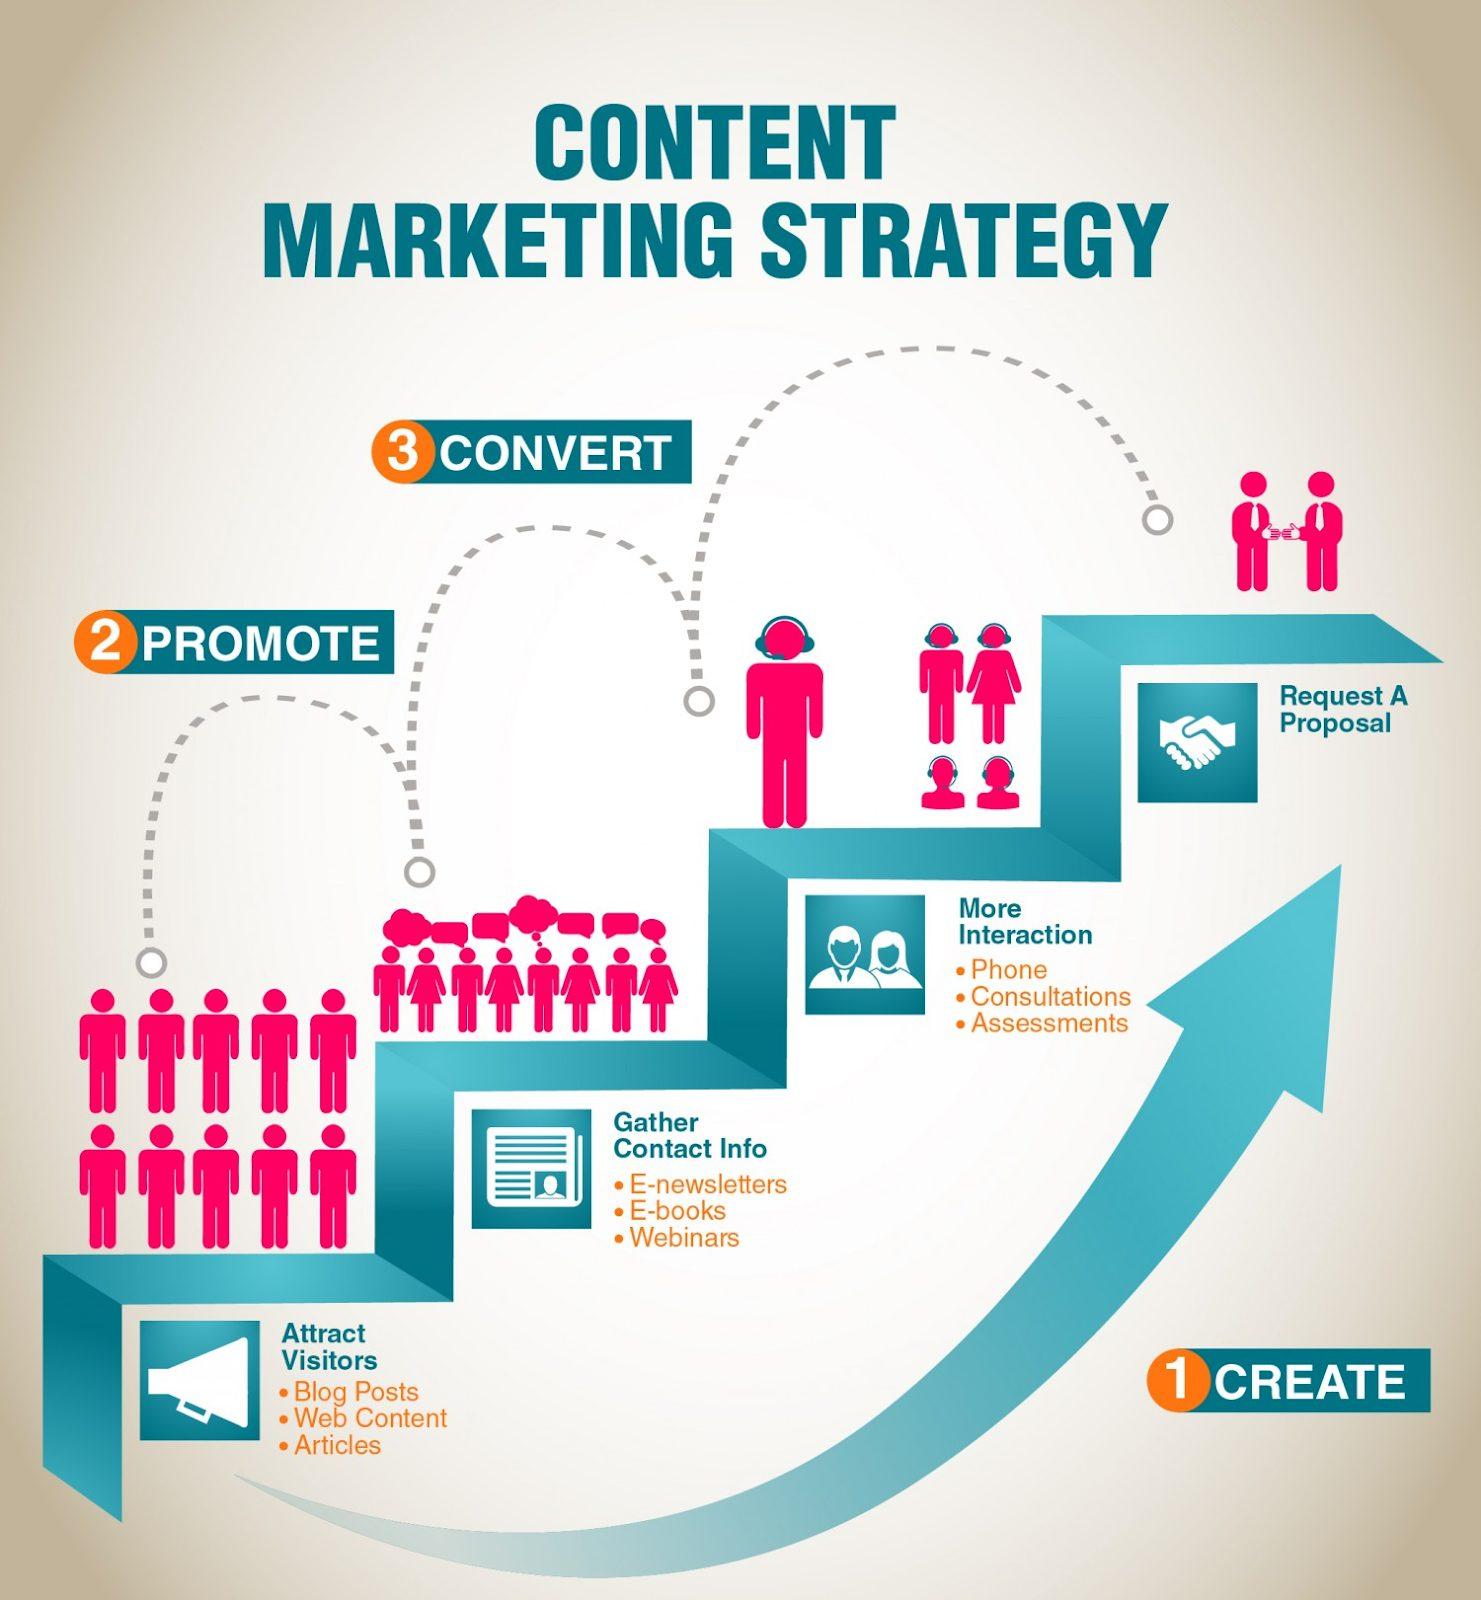 Content Marketing Strategy 2020 Basics